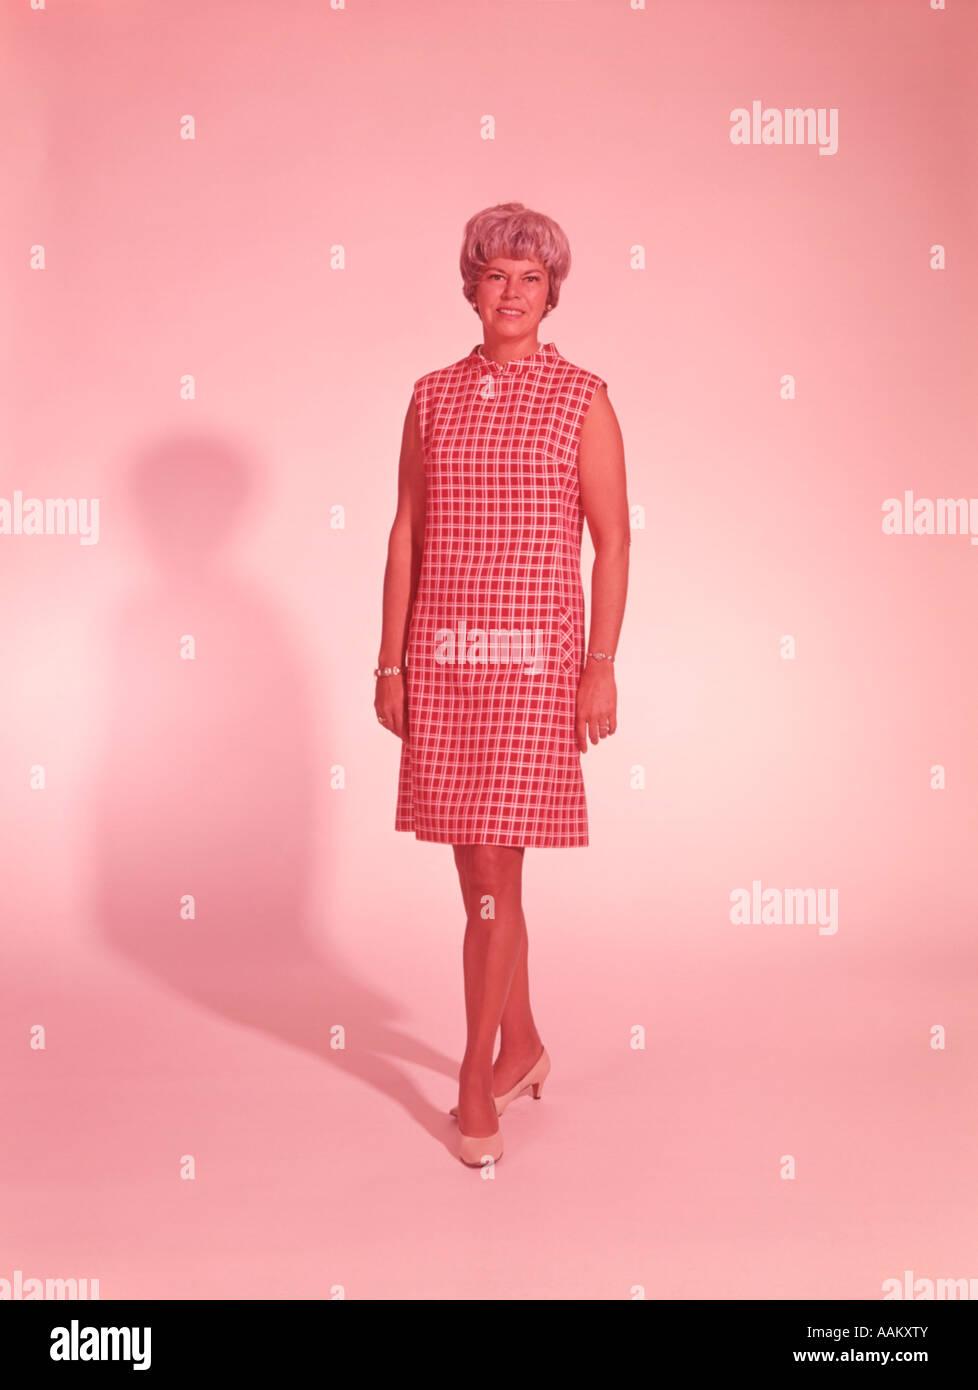 1960s Dress Imágenes De Stock & 1960s Dress Fotos De Stock - Alamy